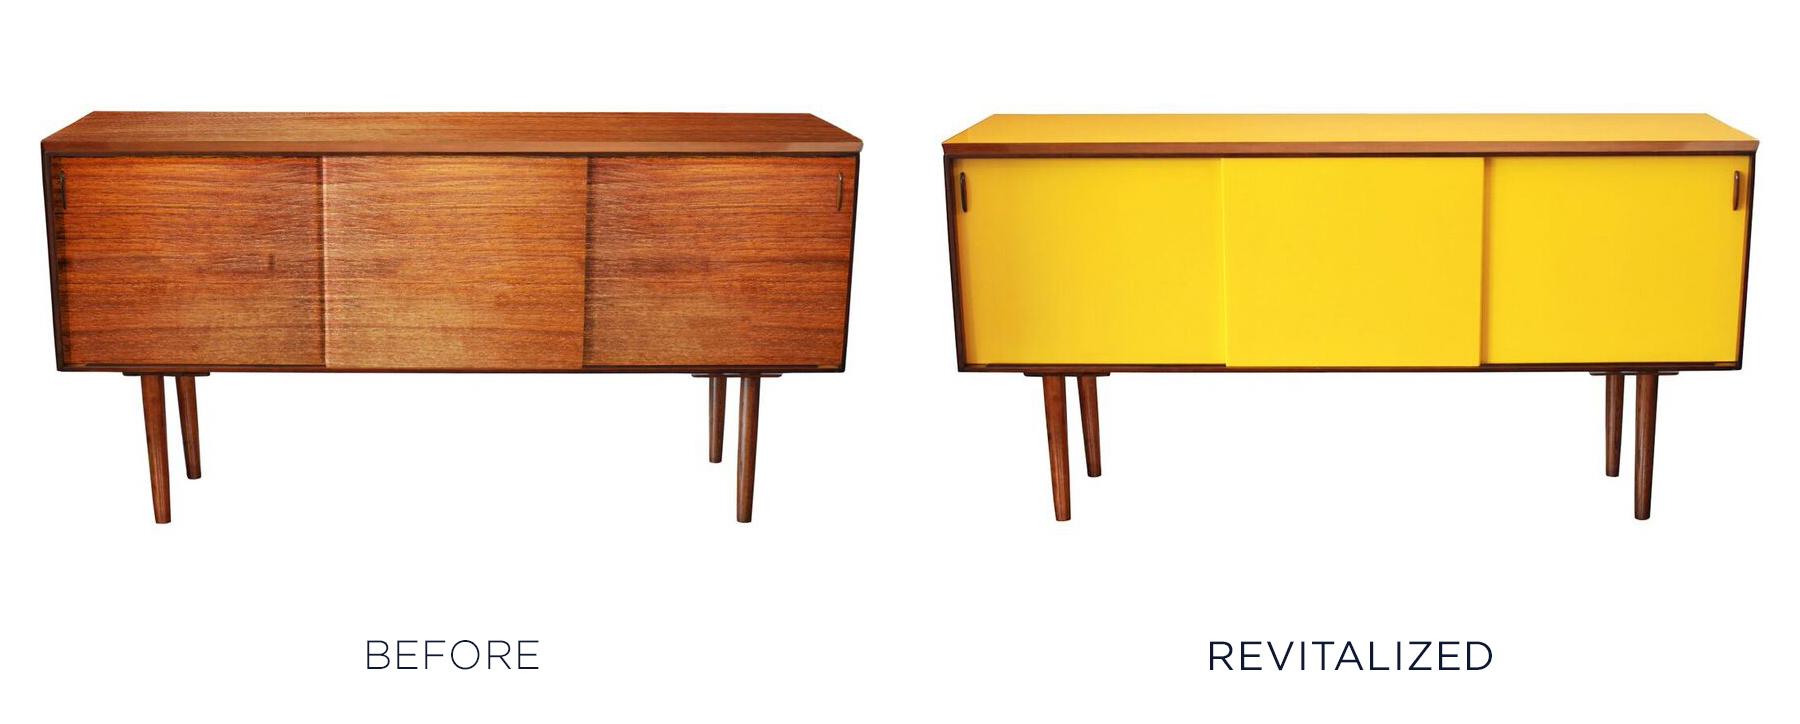 Before and after vintage furniture makeover